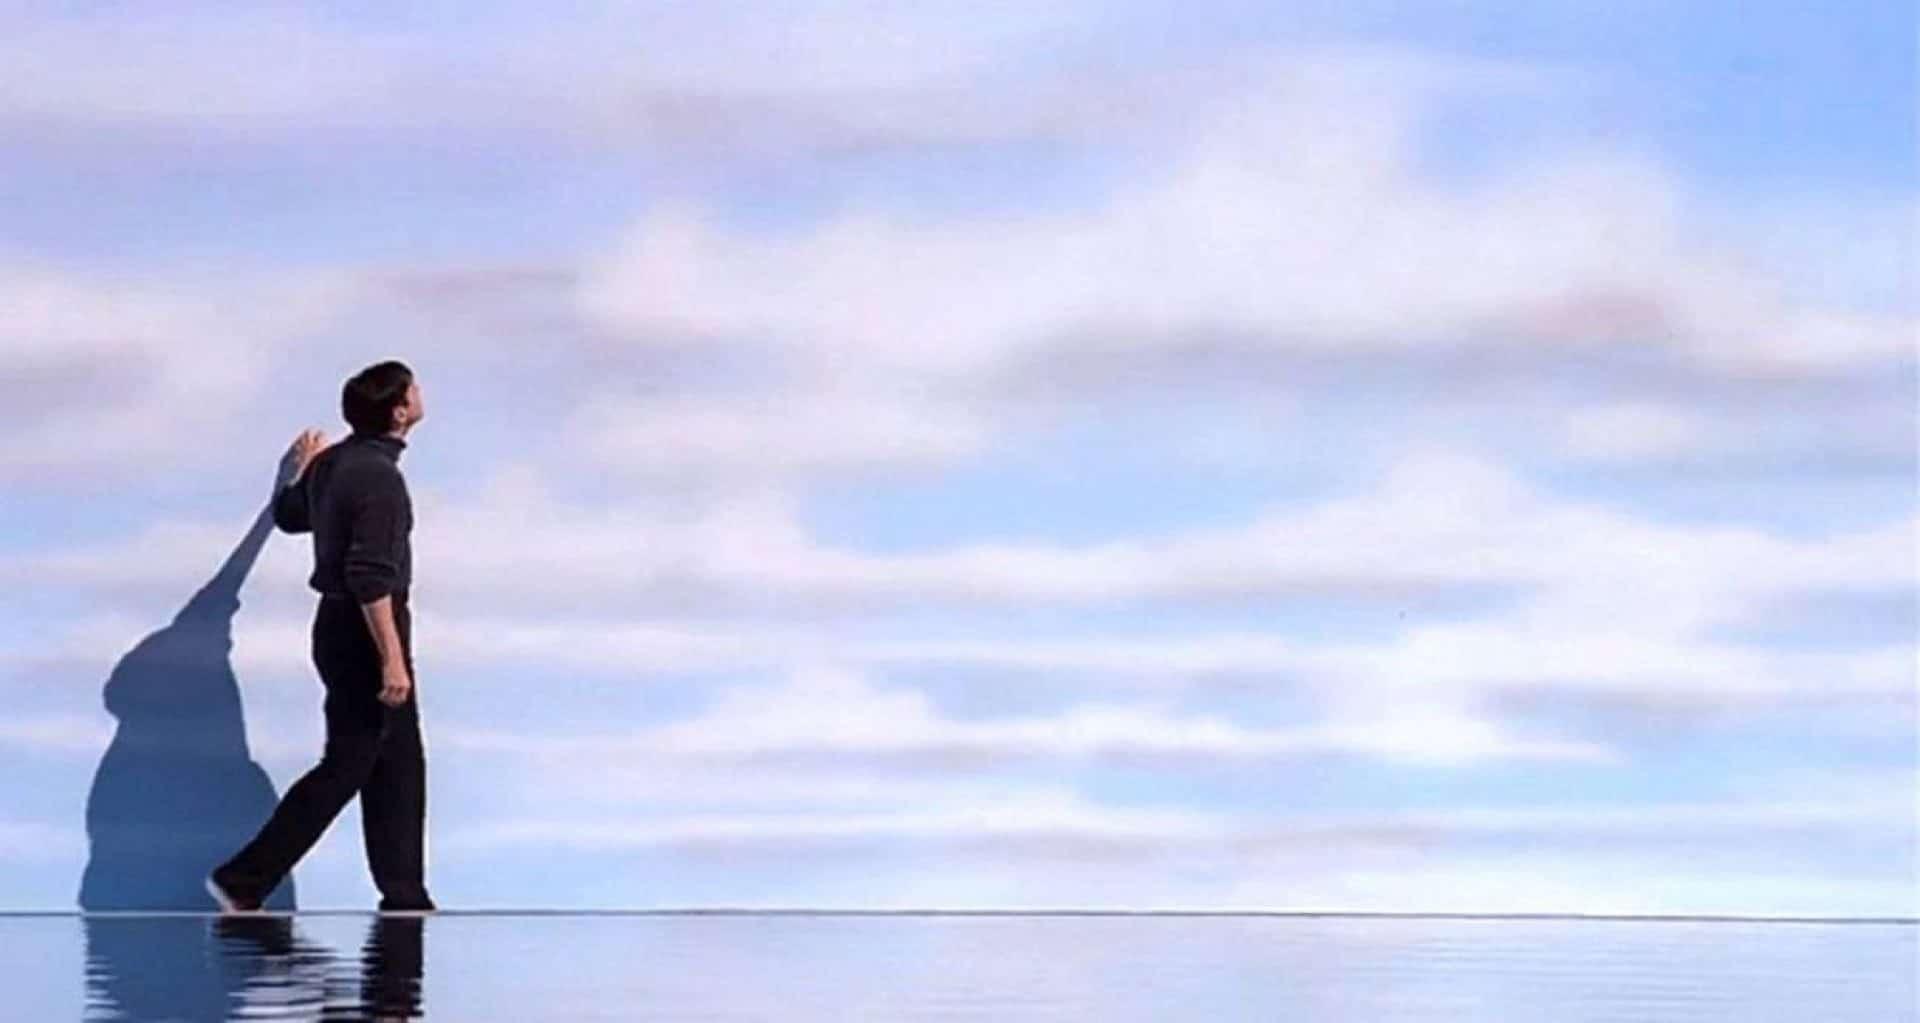 truman horizon